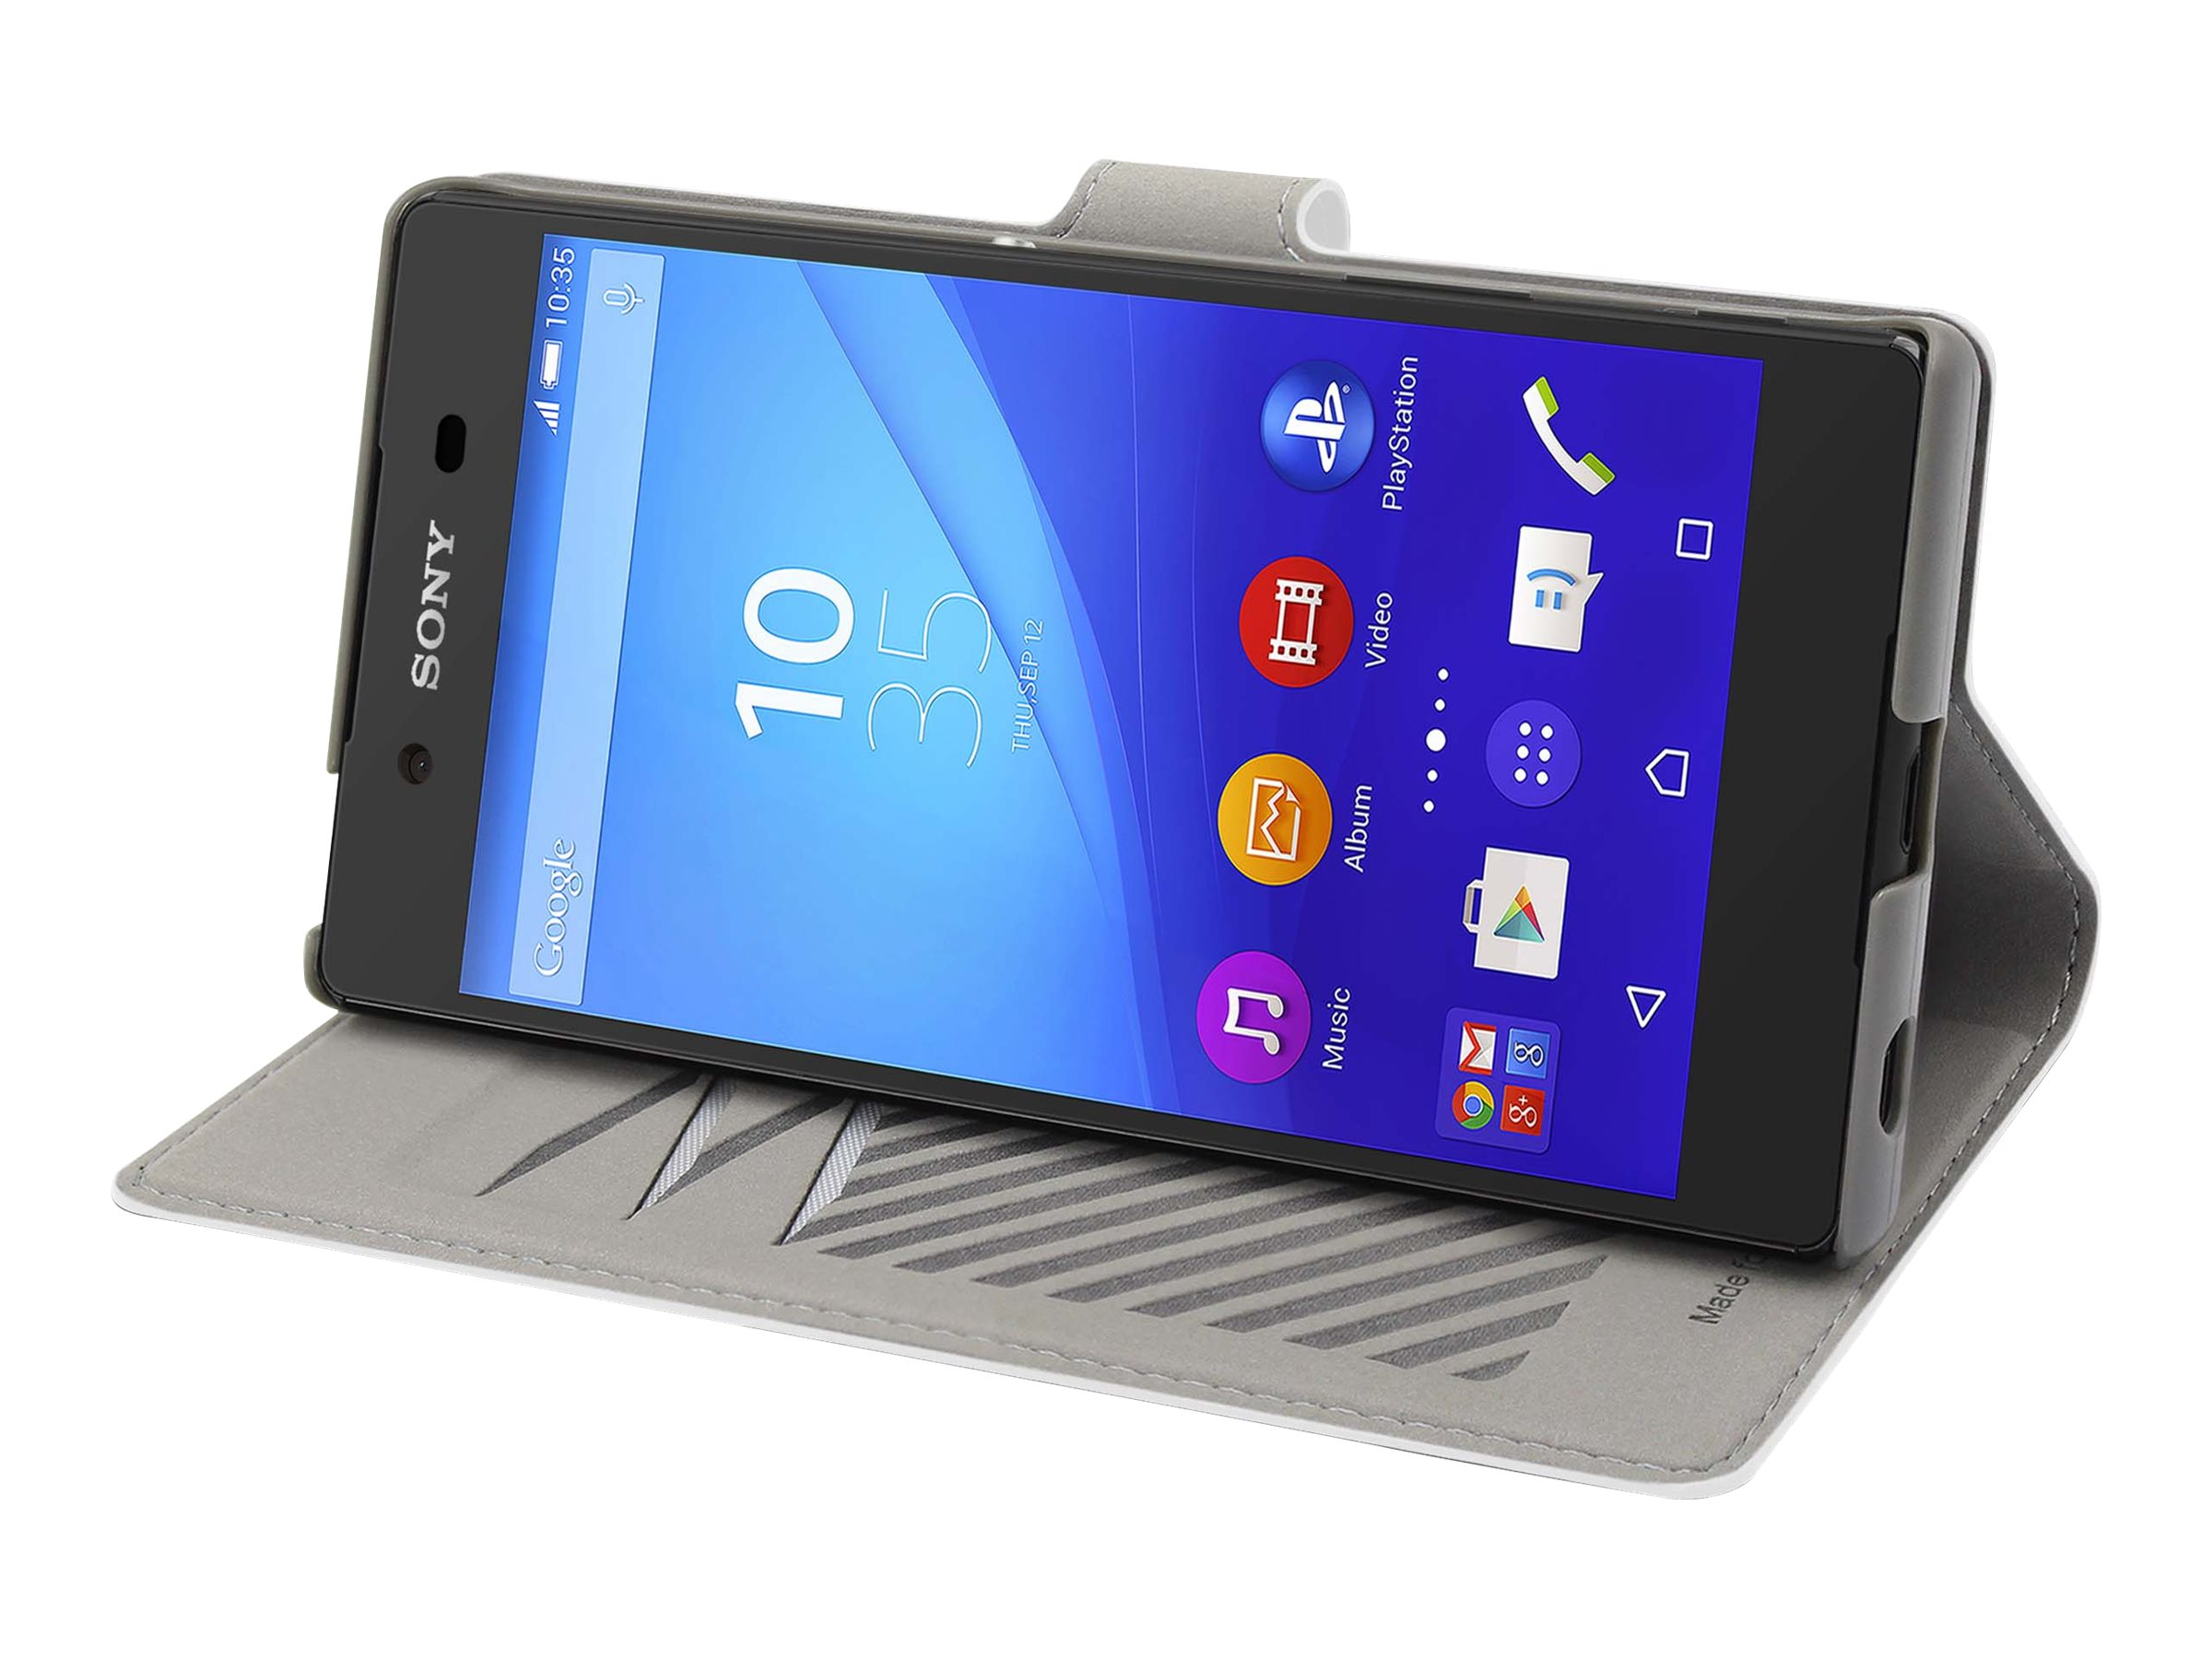 Muvit MFX slim s folio - Protection à rabat pour Sony XPERIA Z5 Premium - blanc